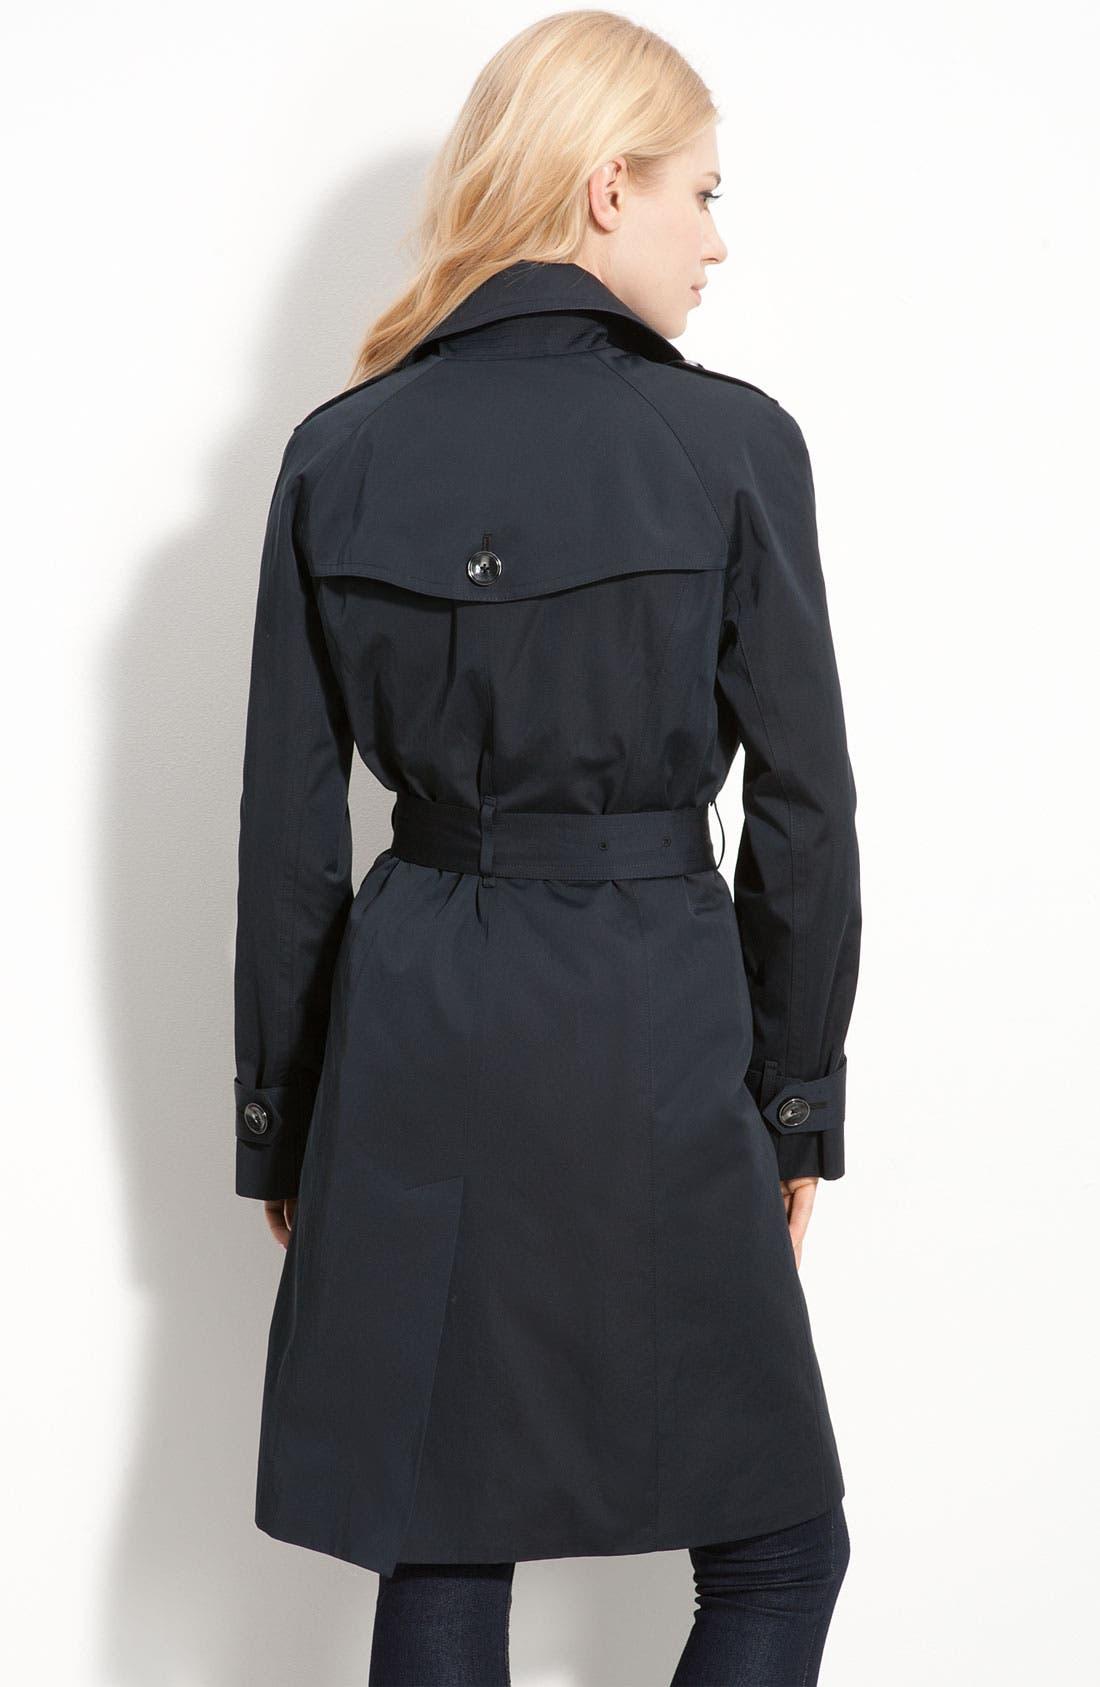 Alternate Image 2  - London Fog Heritage Raglan Sleeve Trench Coat with Detachable Liner (Nordstrom Exclusive)